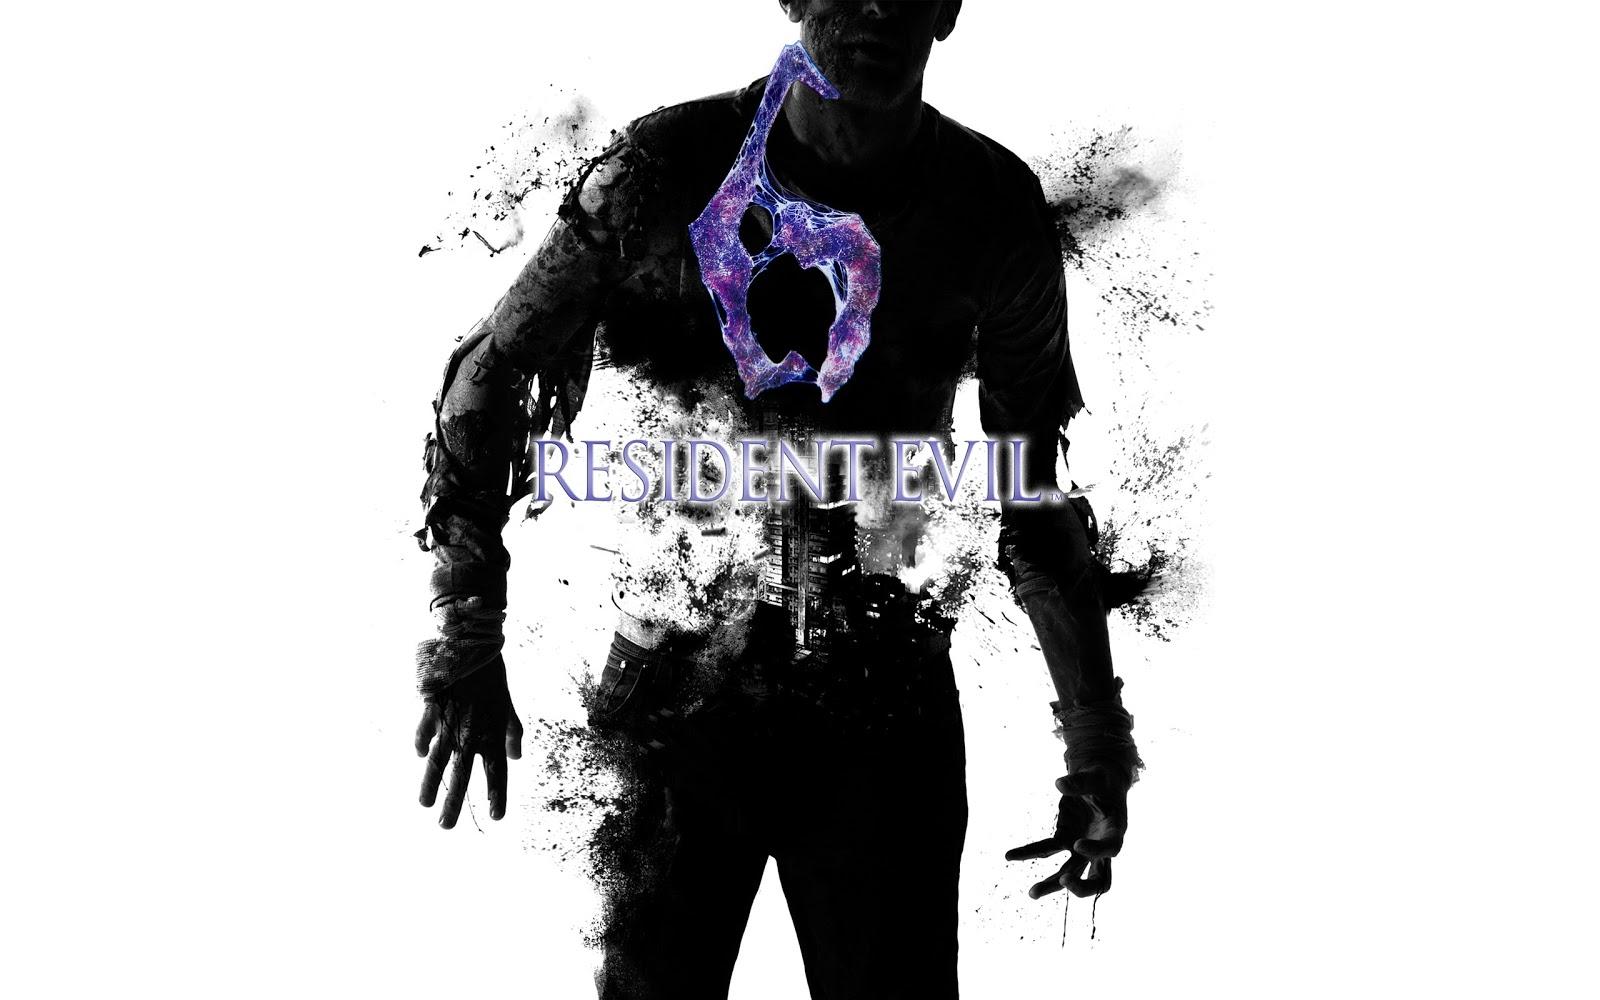 http://1.bp.blogspot.com/-Ta-Foe3I8rk/UIQlKLP3kgI/AAAAAAAAFlM/zj0Lp5ZC8Yg/s1600/Resident-Evil-6-Game-Zombie-HD-Wallpaper-GameWallBase.Com.jpg